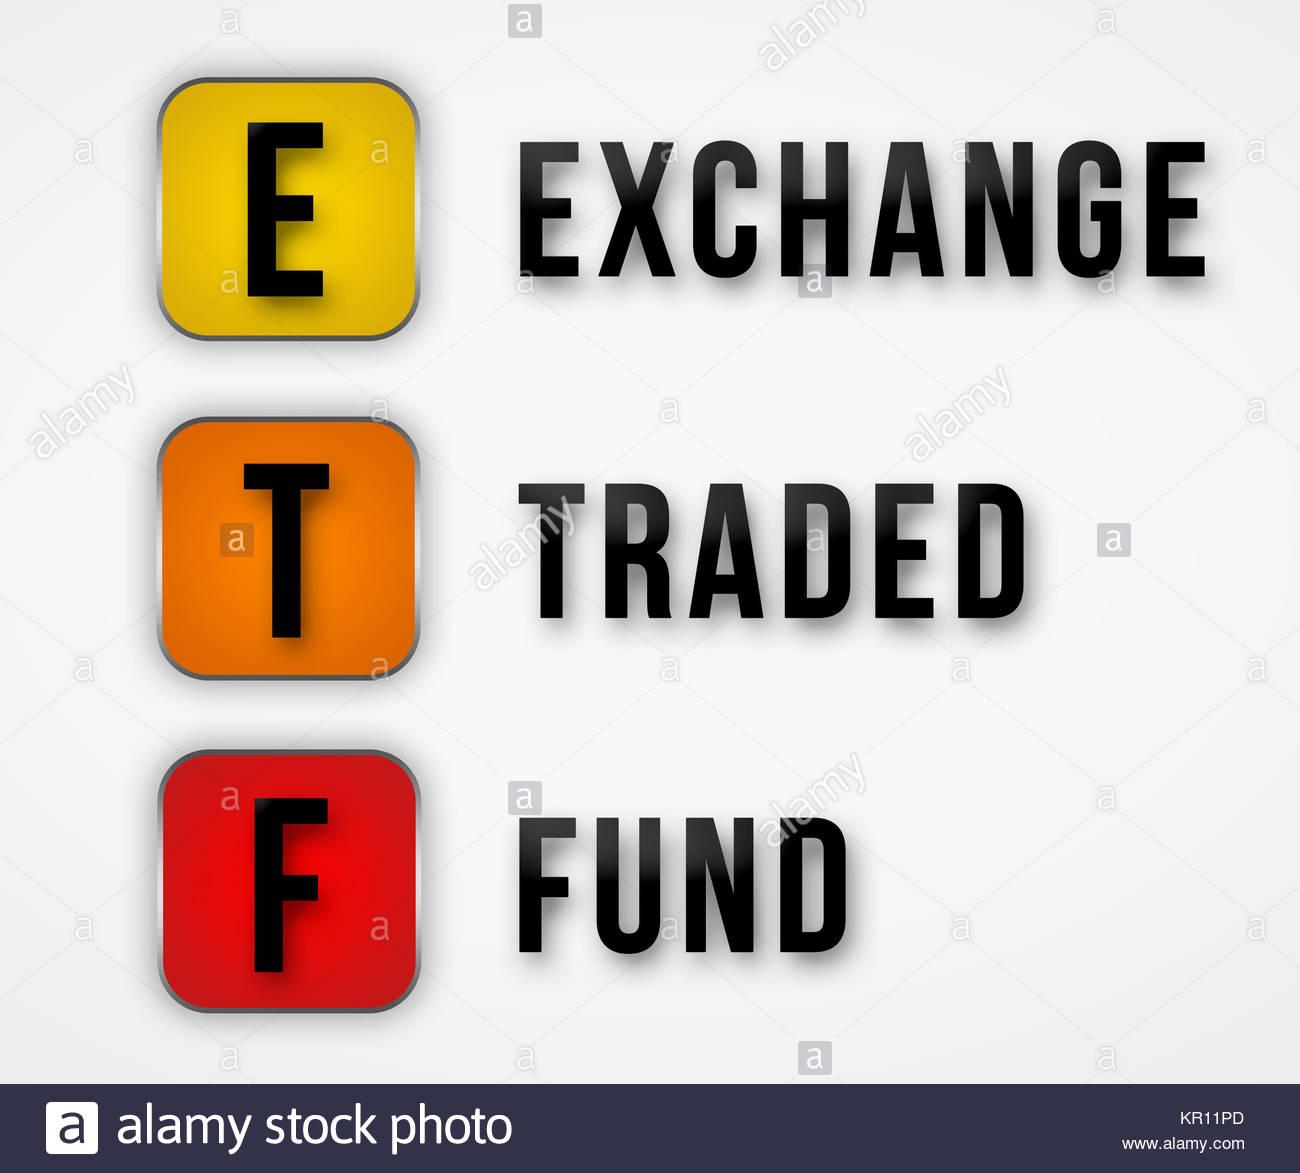 ETF - Exchange Traded Fund Stock Photo